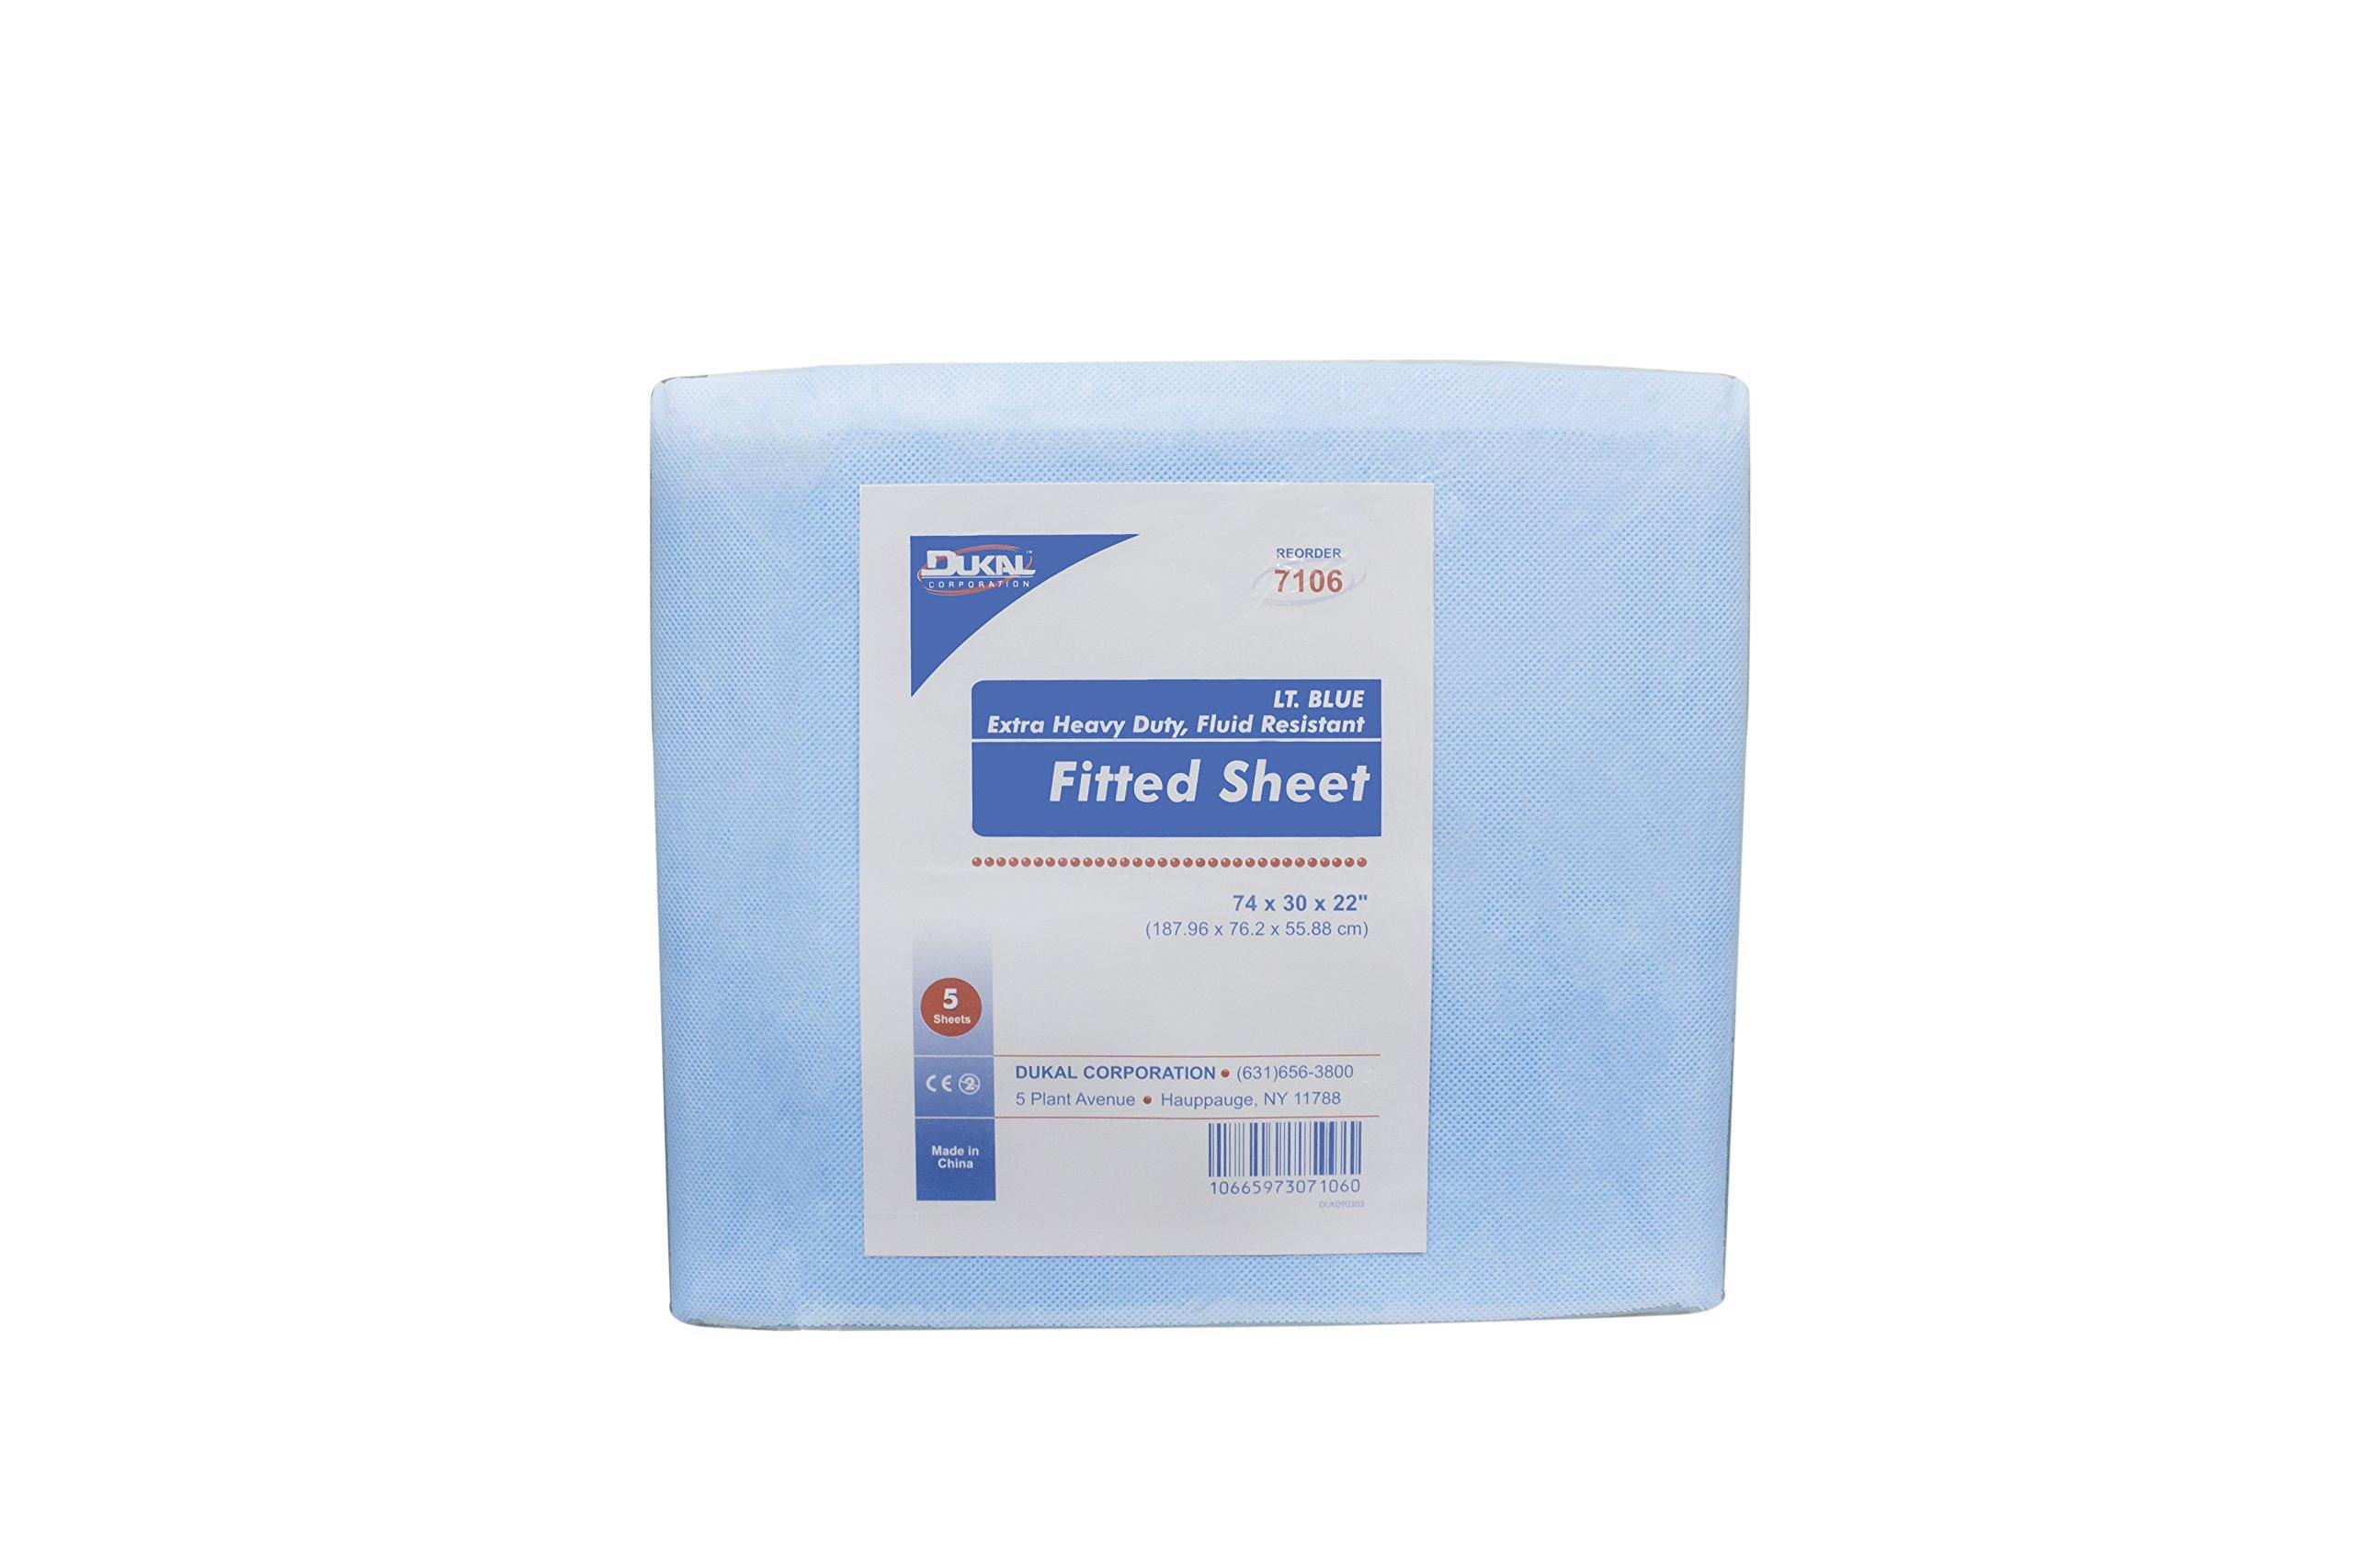 DUKAL 7106 Flat SHeet, Fluid Resistent, Light Blue, 74'' x 30''x 22'', Non Sterile